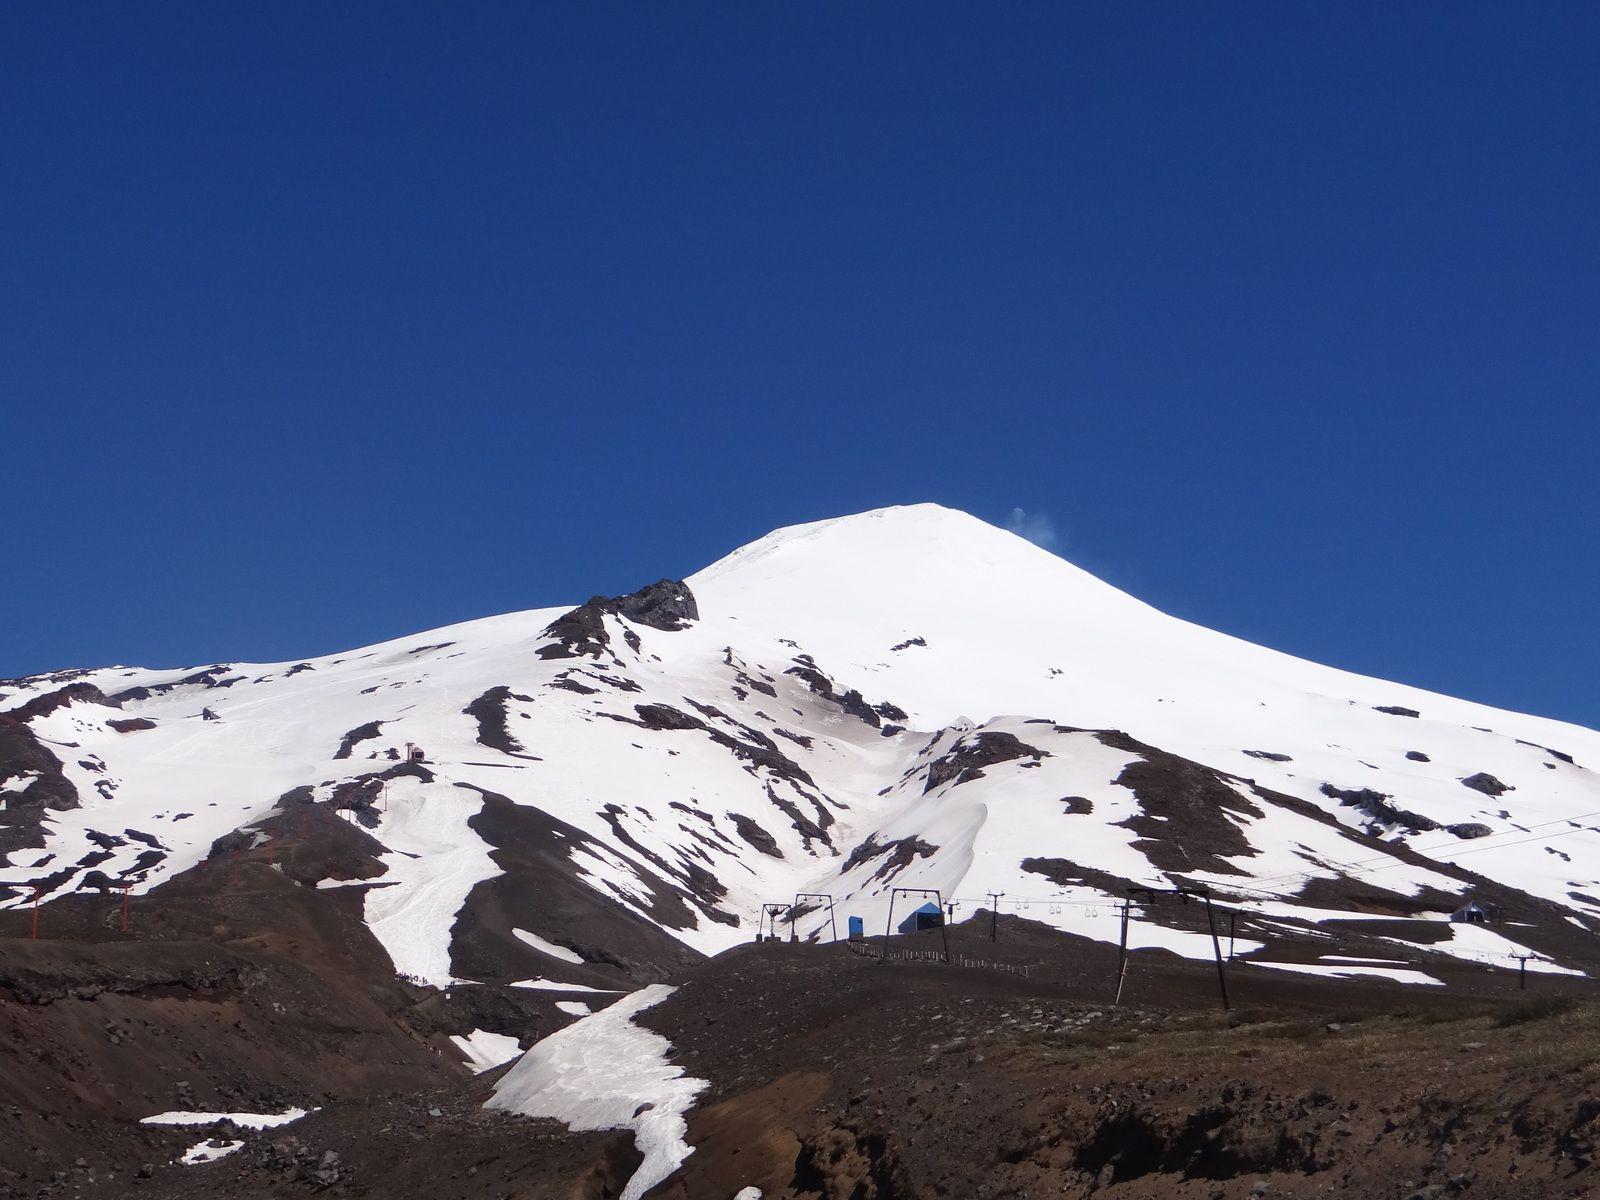 Voyage au Chili en 2013. 1ère partie San Pédro Atacama. Chanaral. Valparaiso. Pucon